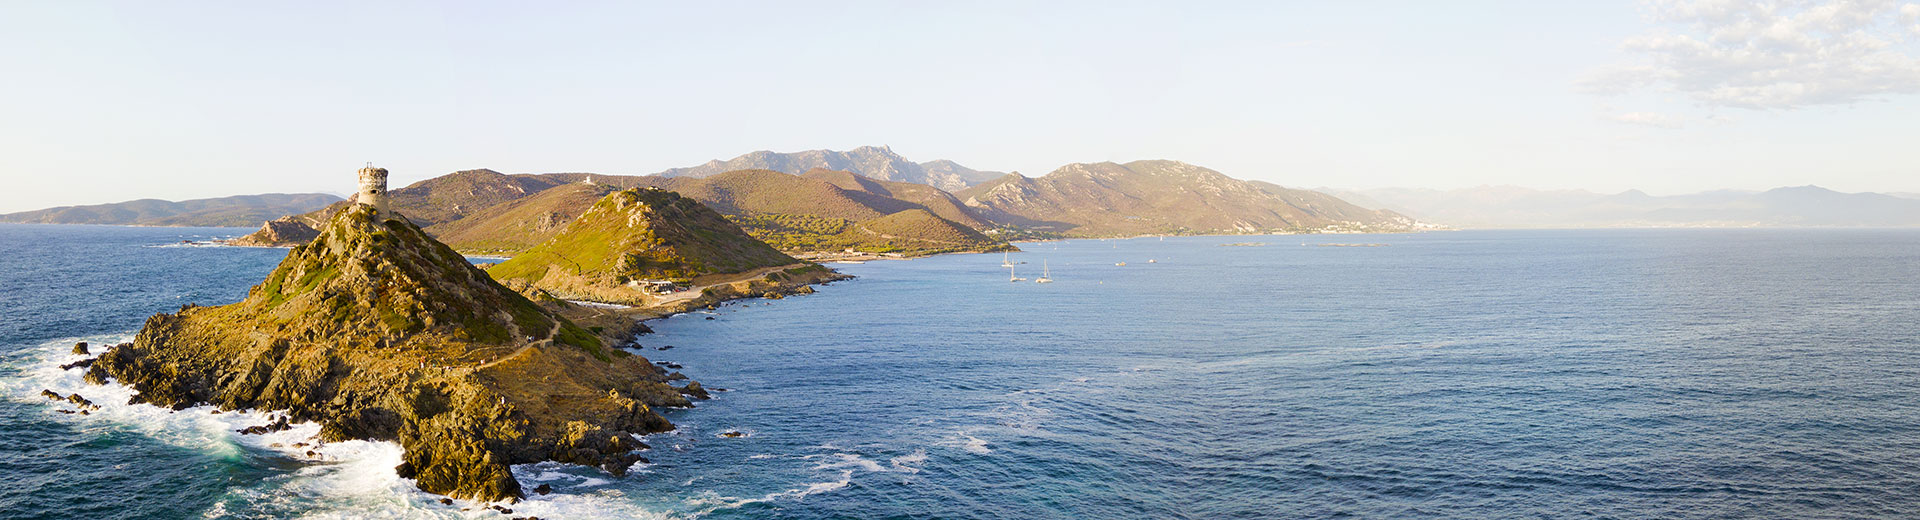 Kurztrip nach Korsika – Ostern in Korsika